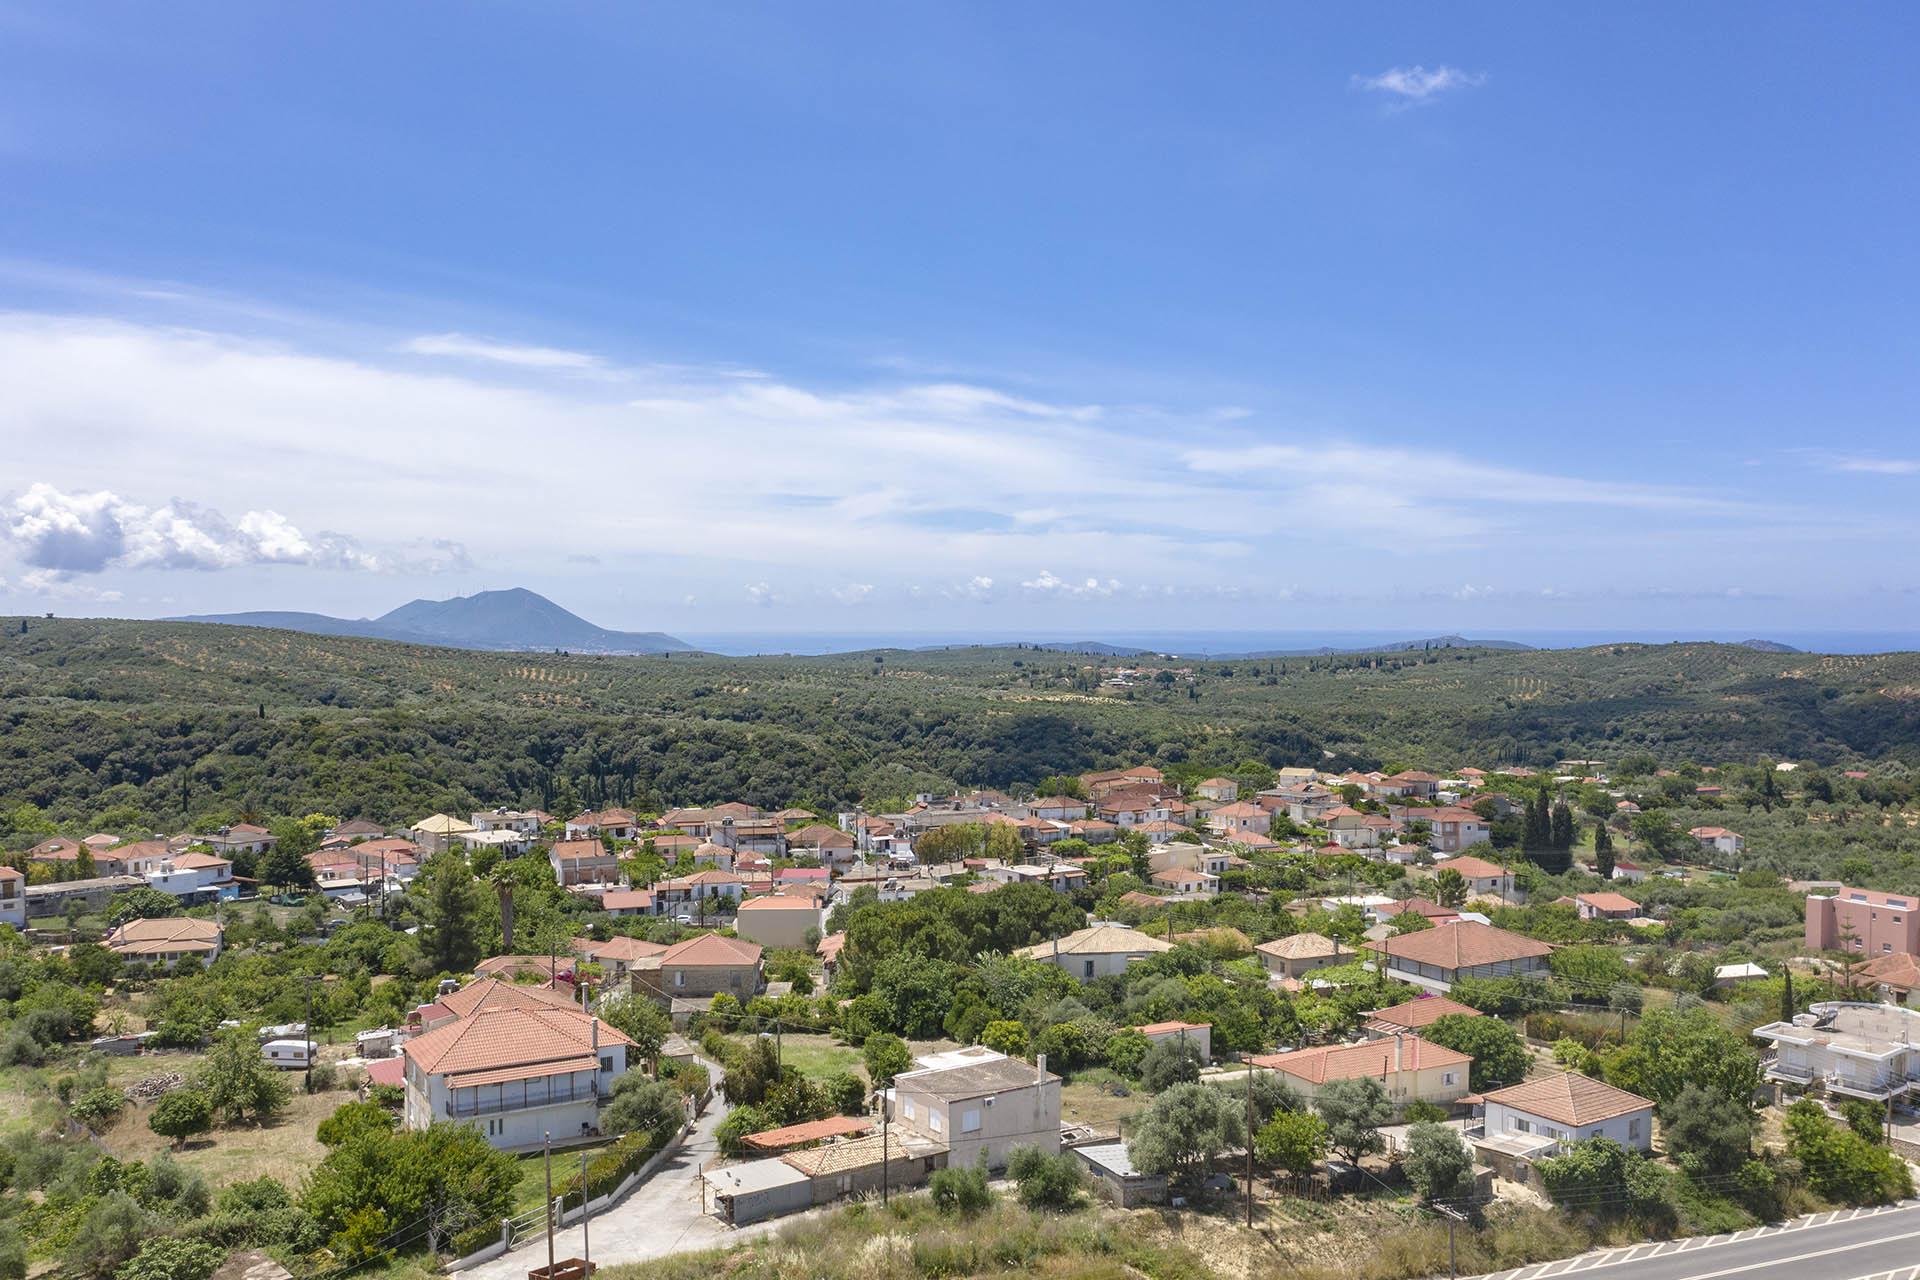 Tsaglis Extra Virgin Olive Oil - Kalamata Messinia - Iklaina - Southwest Peloponnese